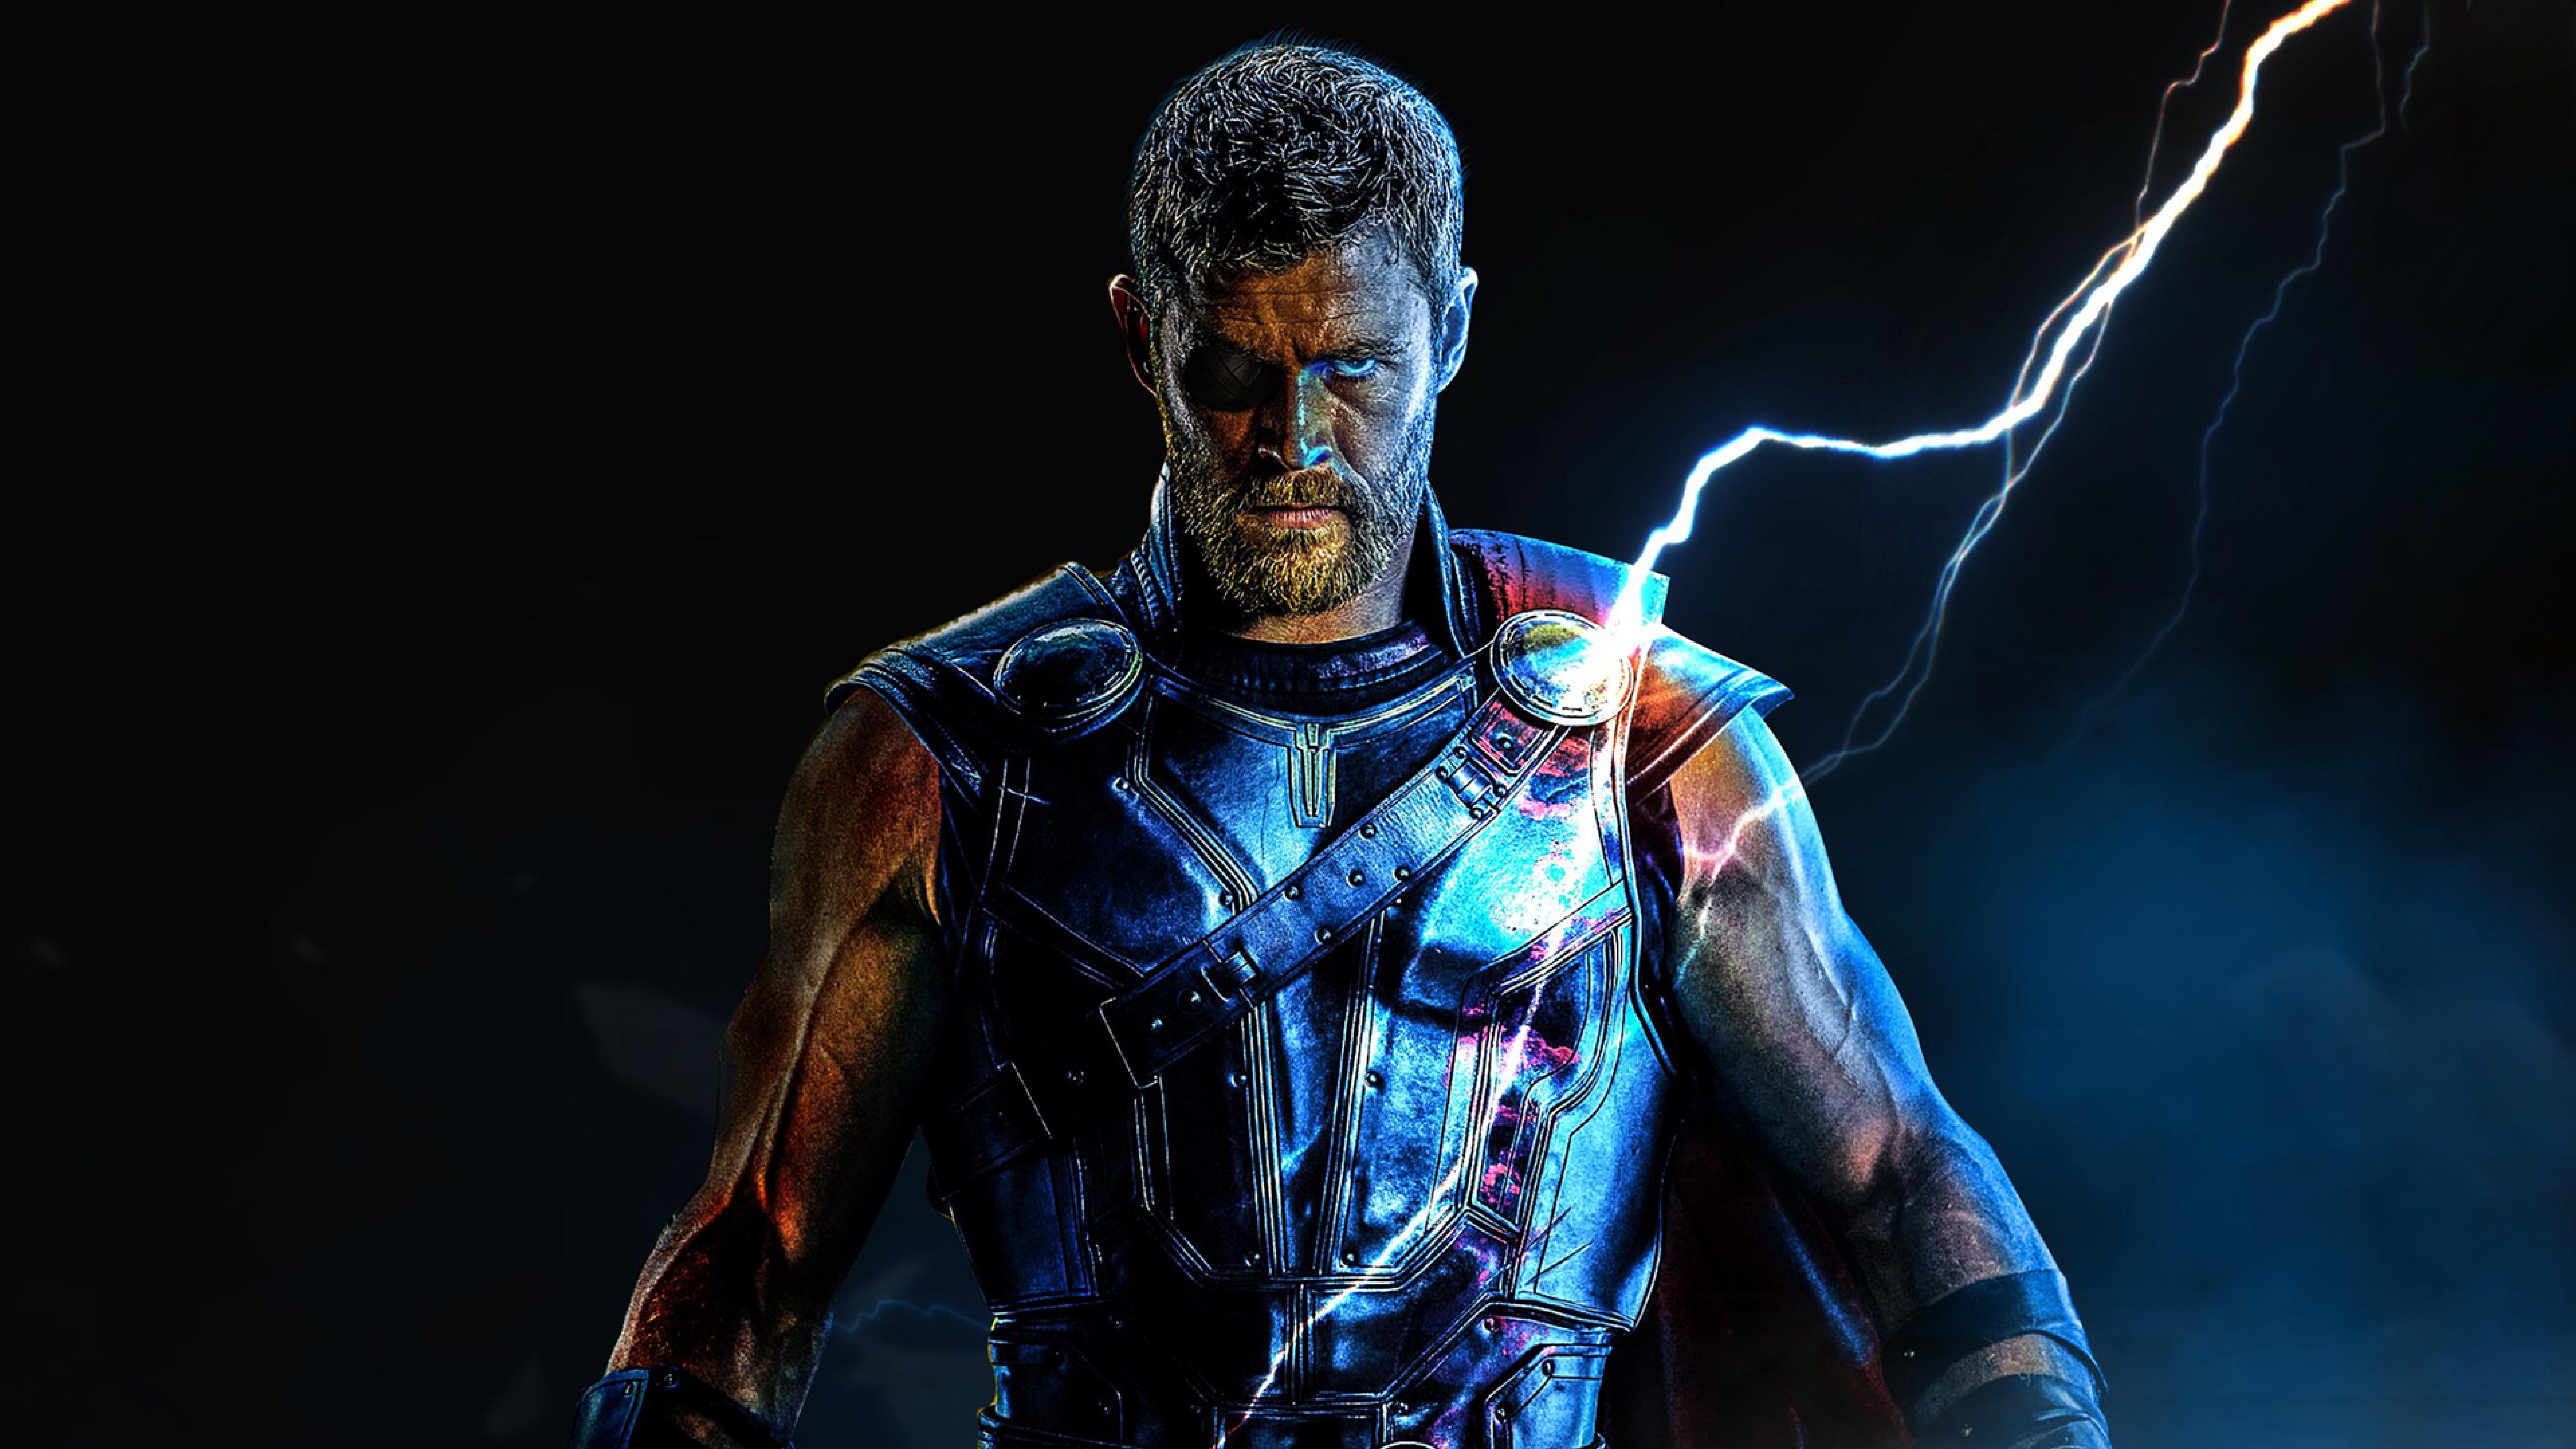 Infinity war thor digital art full hd wallpaper - Thor art wallpaper ...